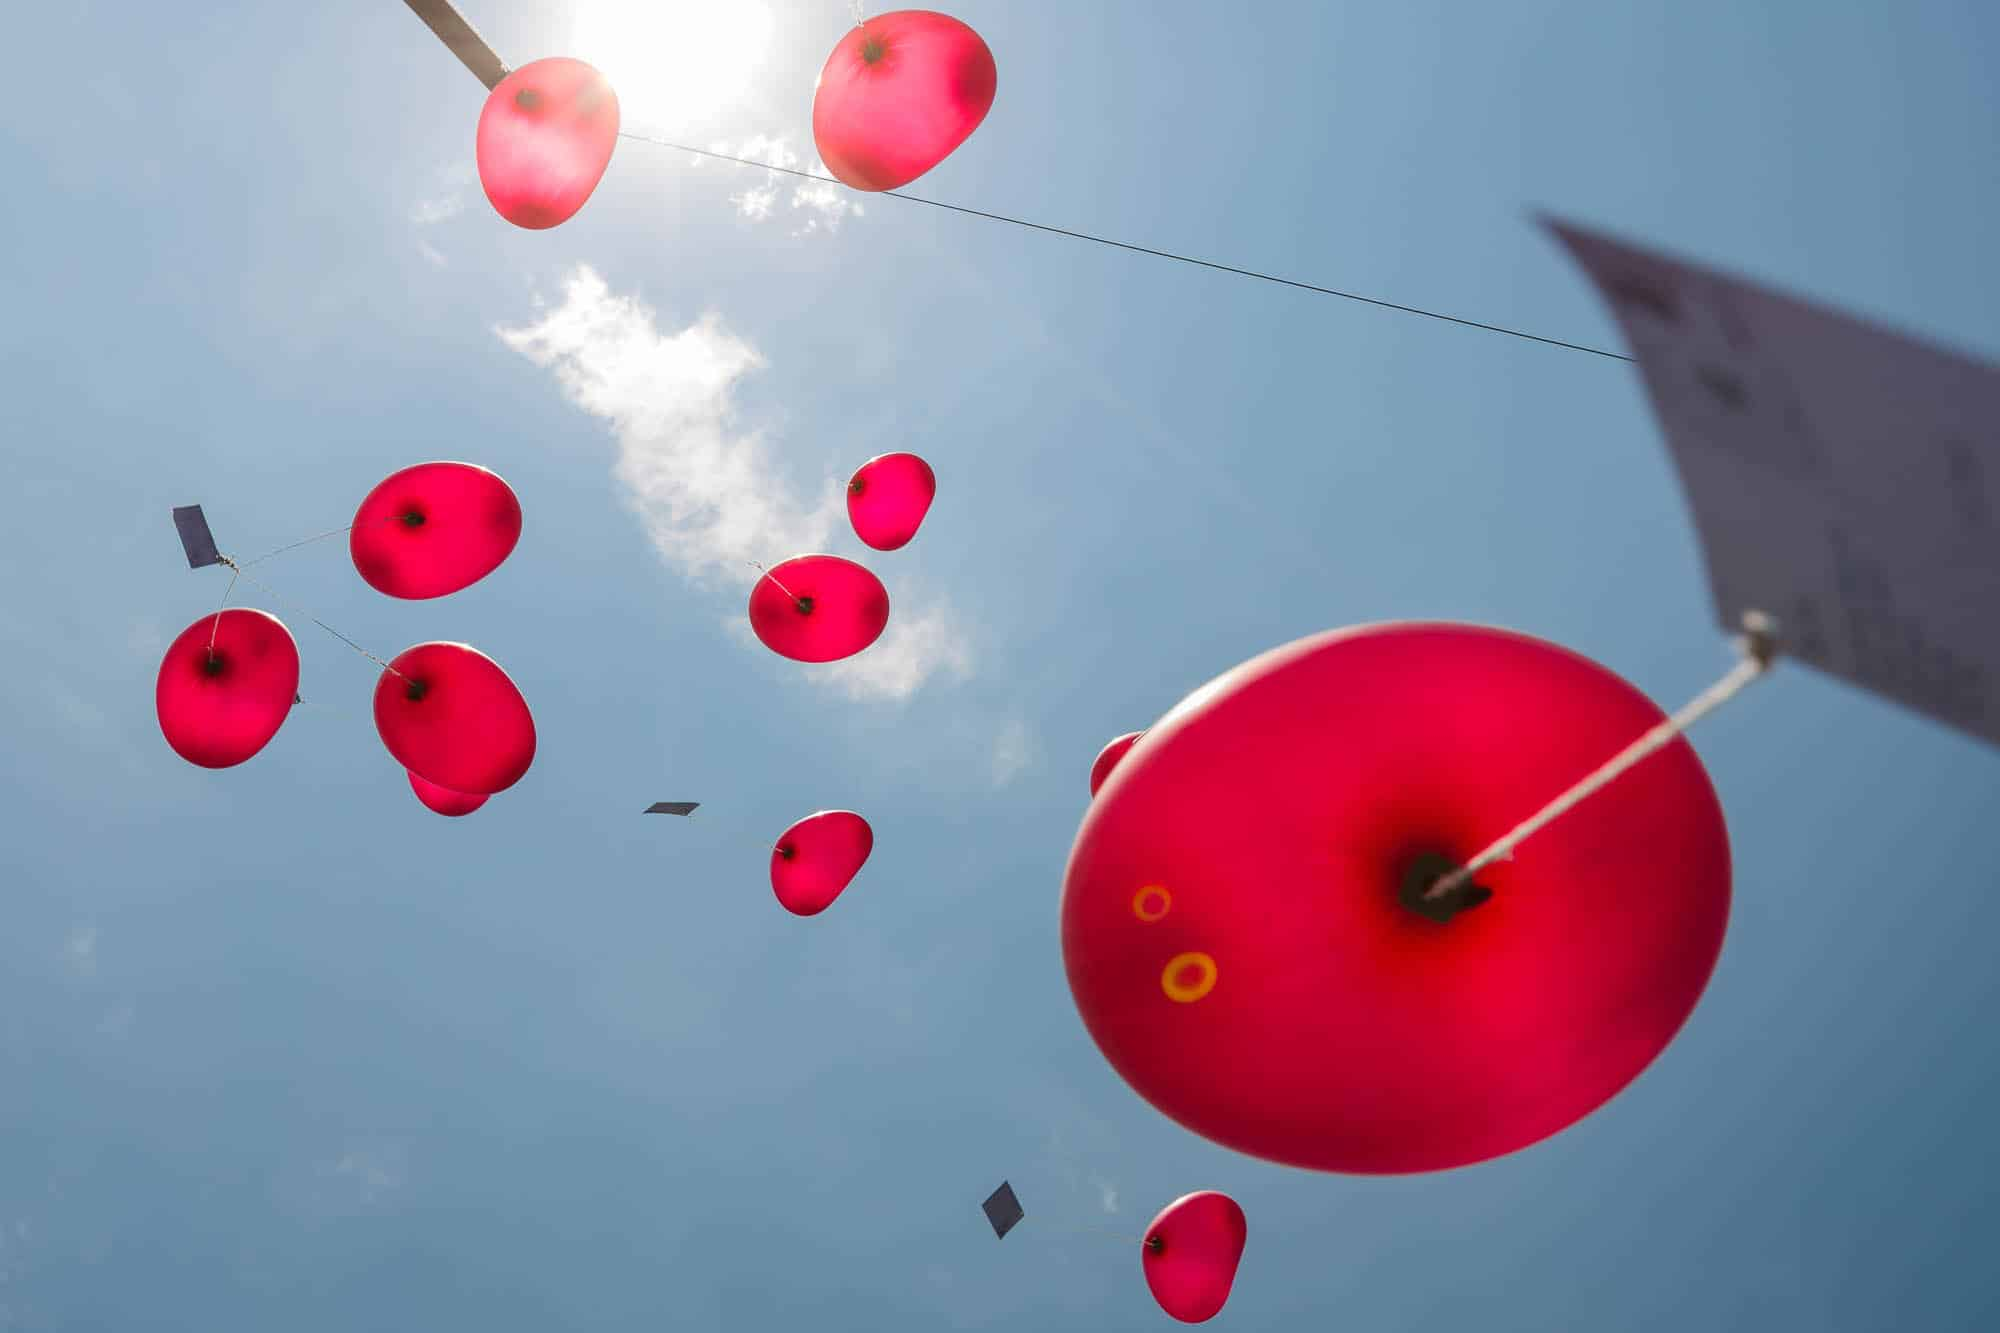 Ballone mit Wunschkarte steigen gen Himmel